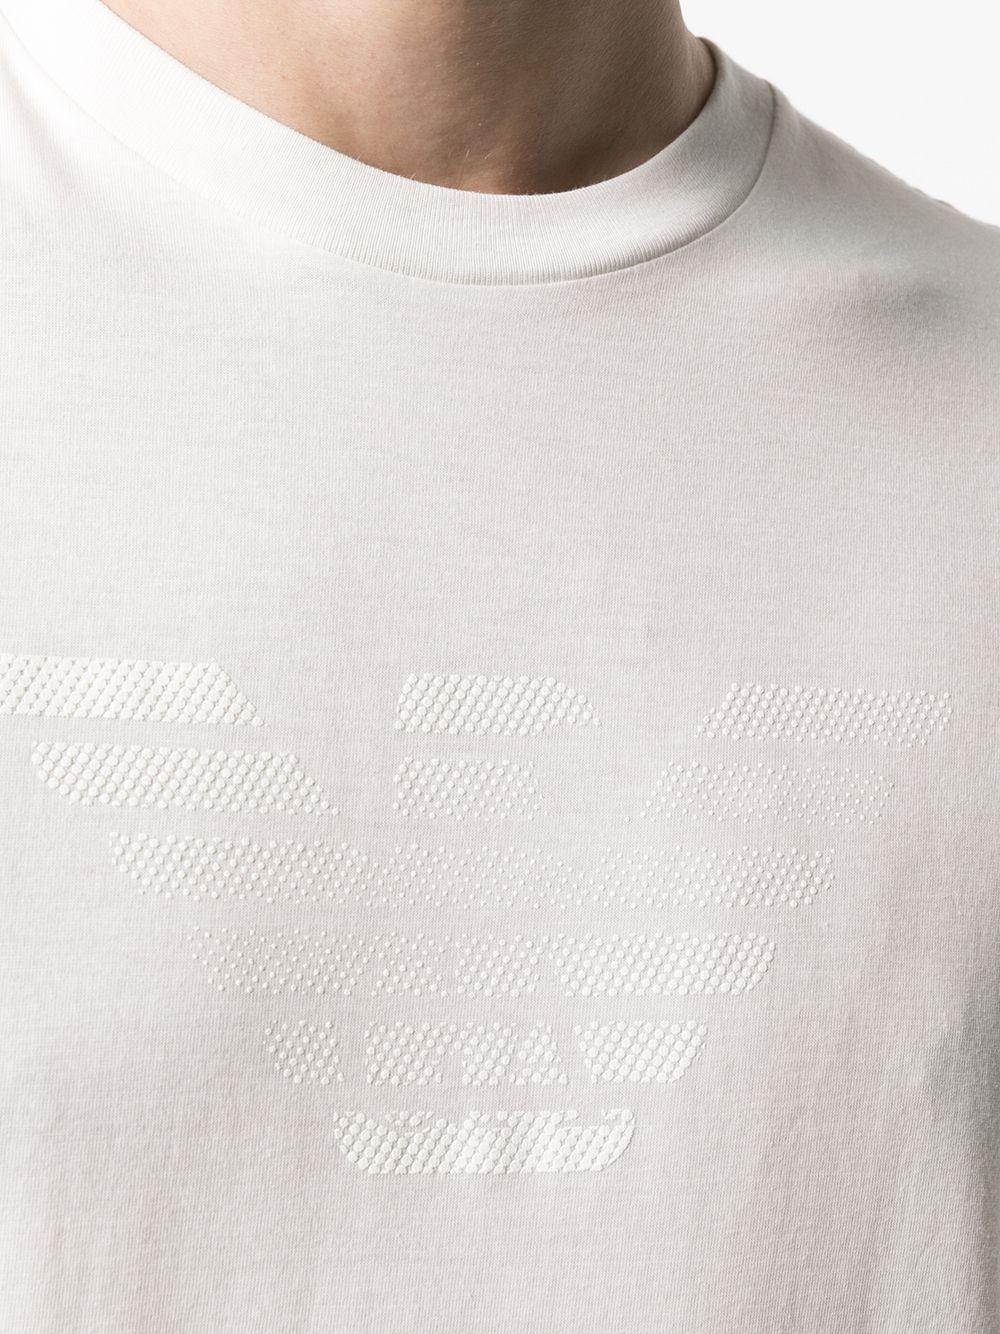 t-shirt bianca GIORGIO ARMANI | T-shirt | 3K1TE61JSHZ0101